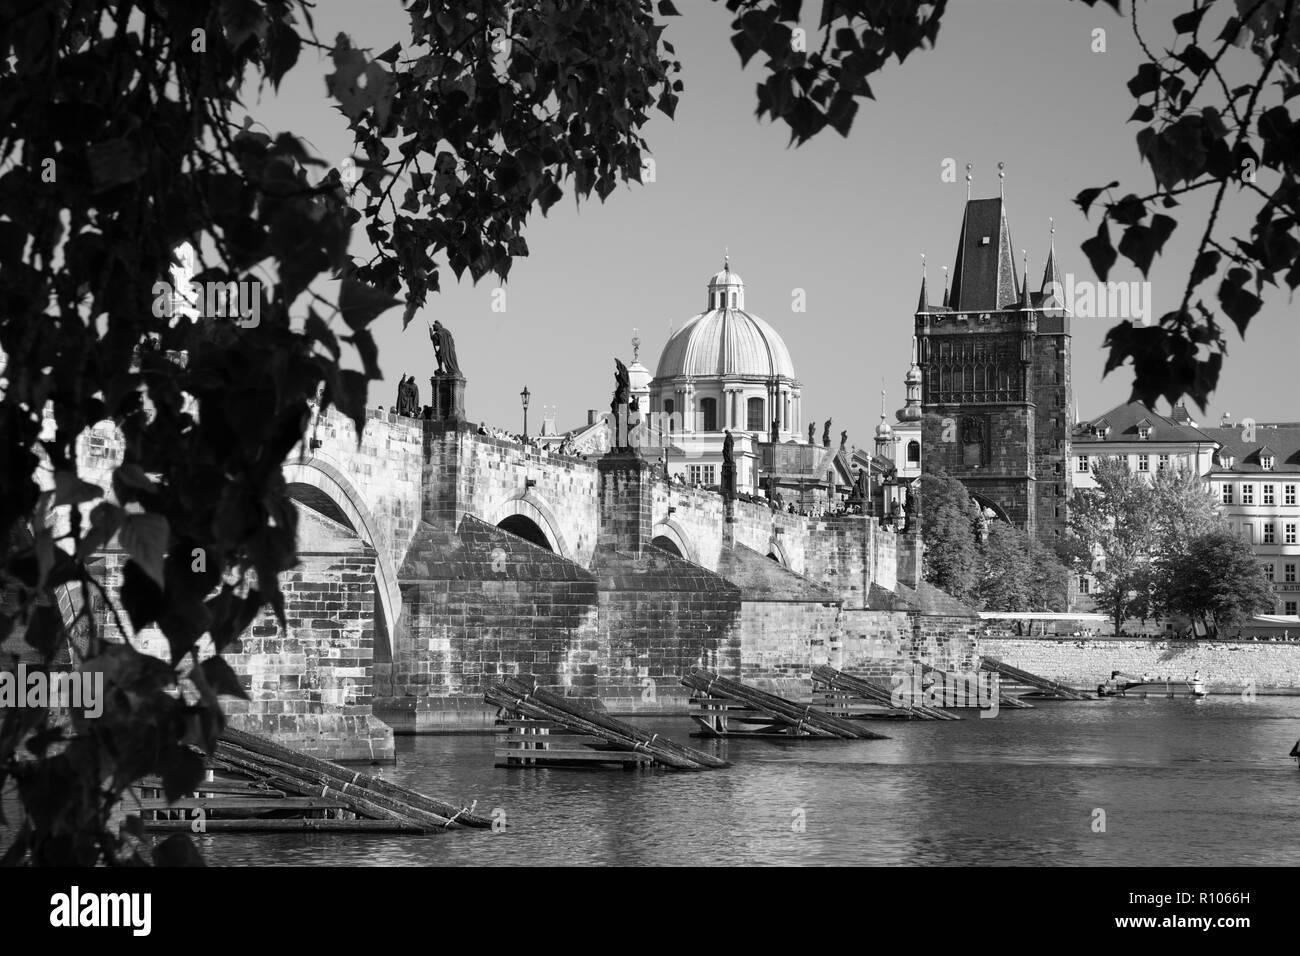 Praghe - The Charles bridge. - Stock Image